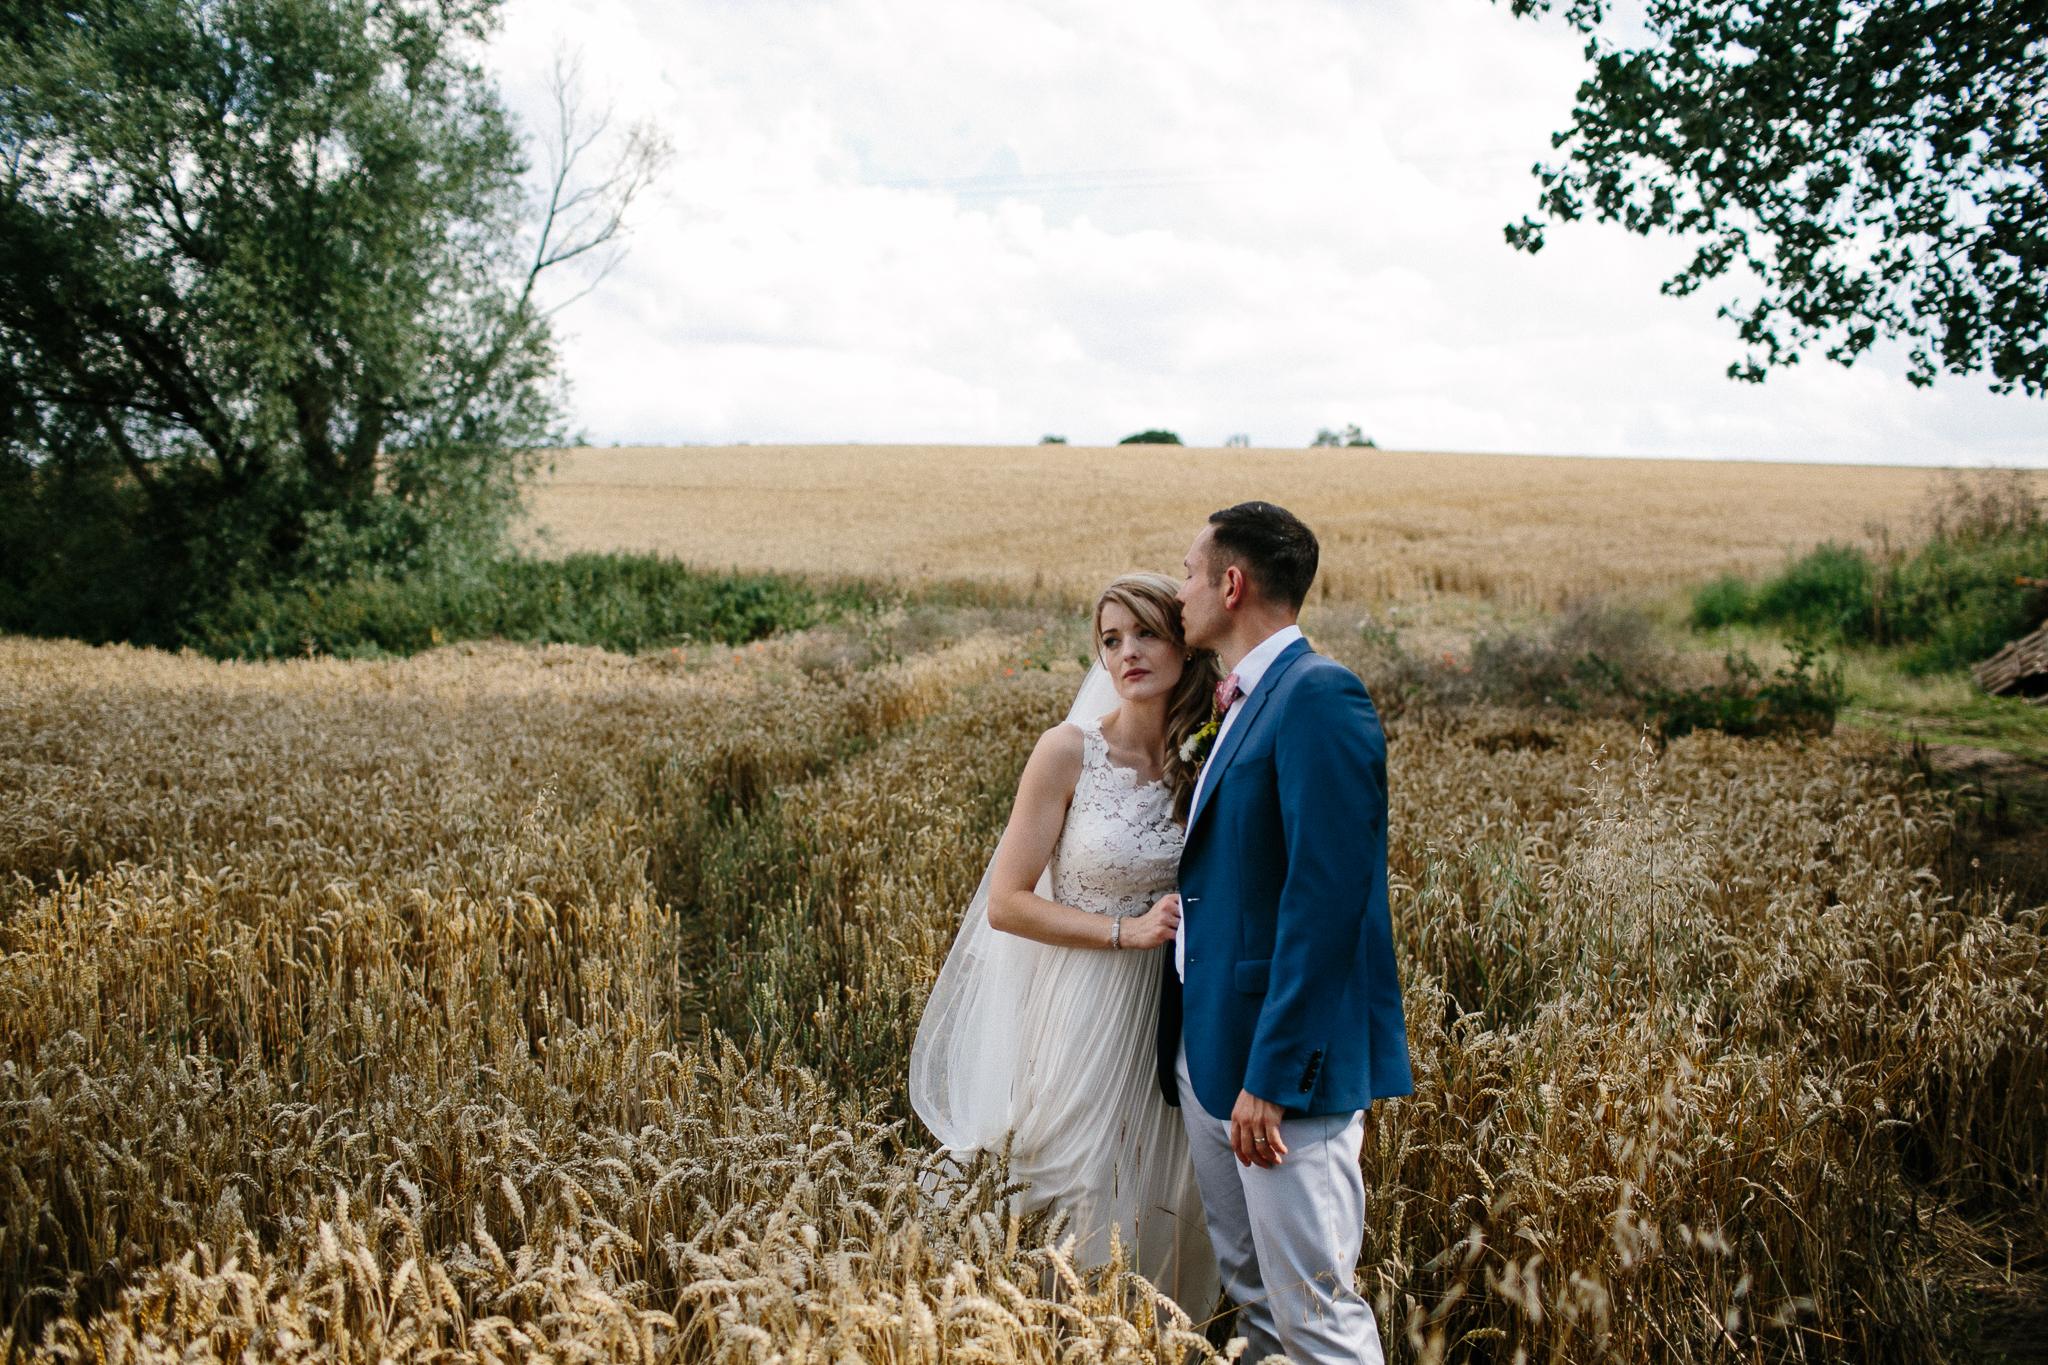 grantham_wedding_photographer-74.jpg